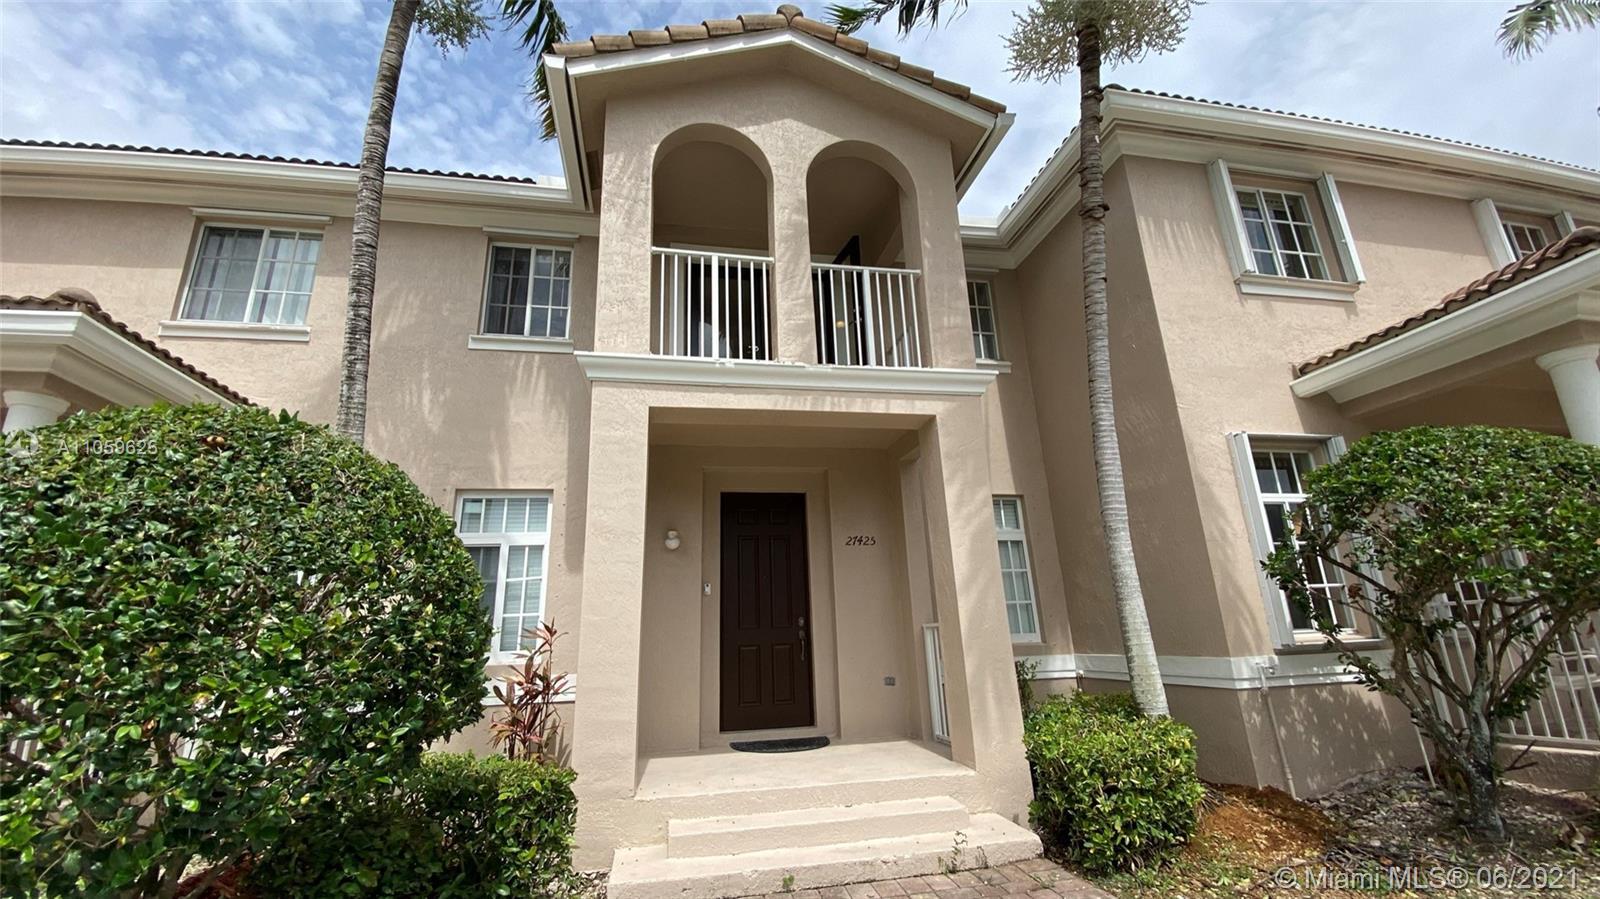 27425 Sw 142nd Ave #27425 Property Photo